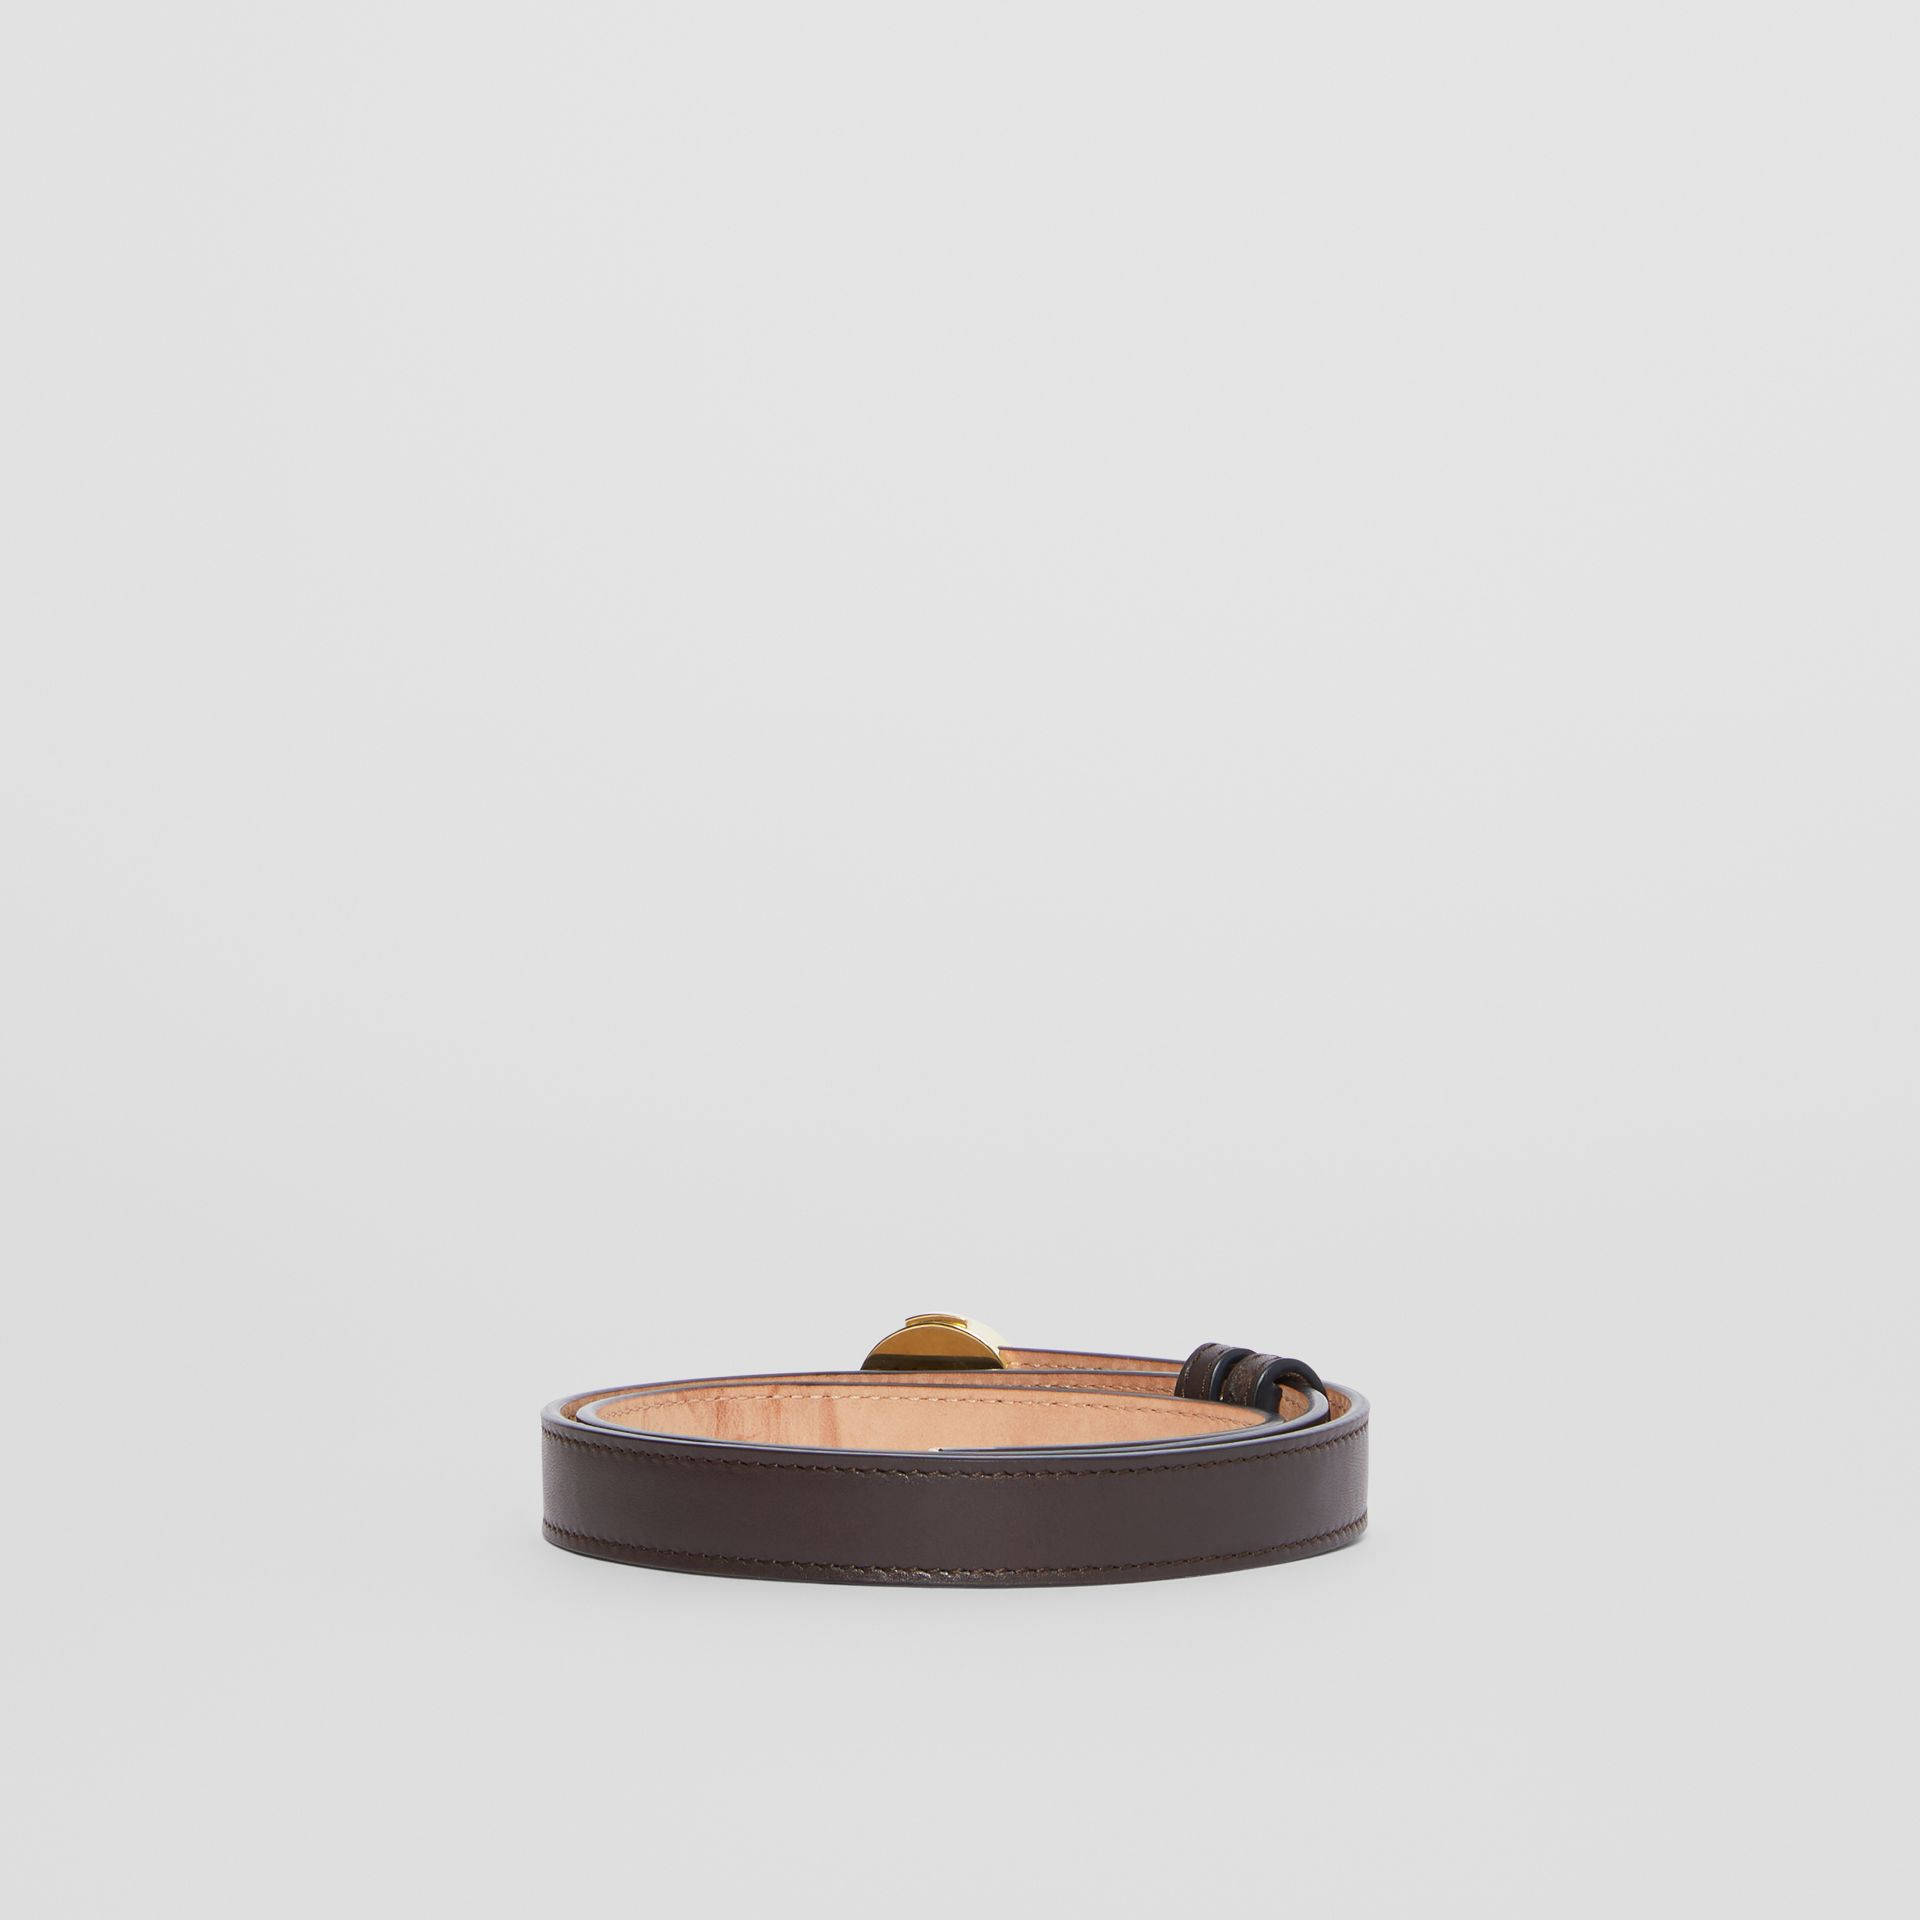 Ceinture en cuir Monogram (Brun Intense) - Femme | Burberry - photo de la galerie 4